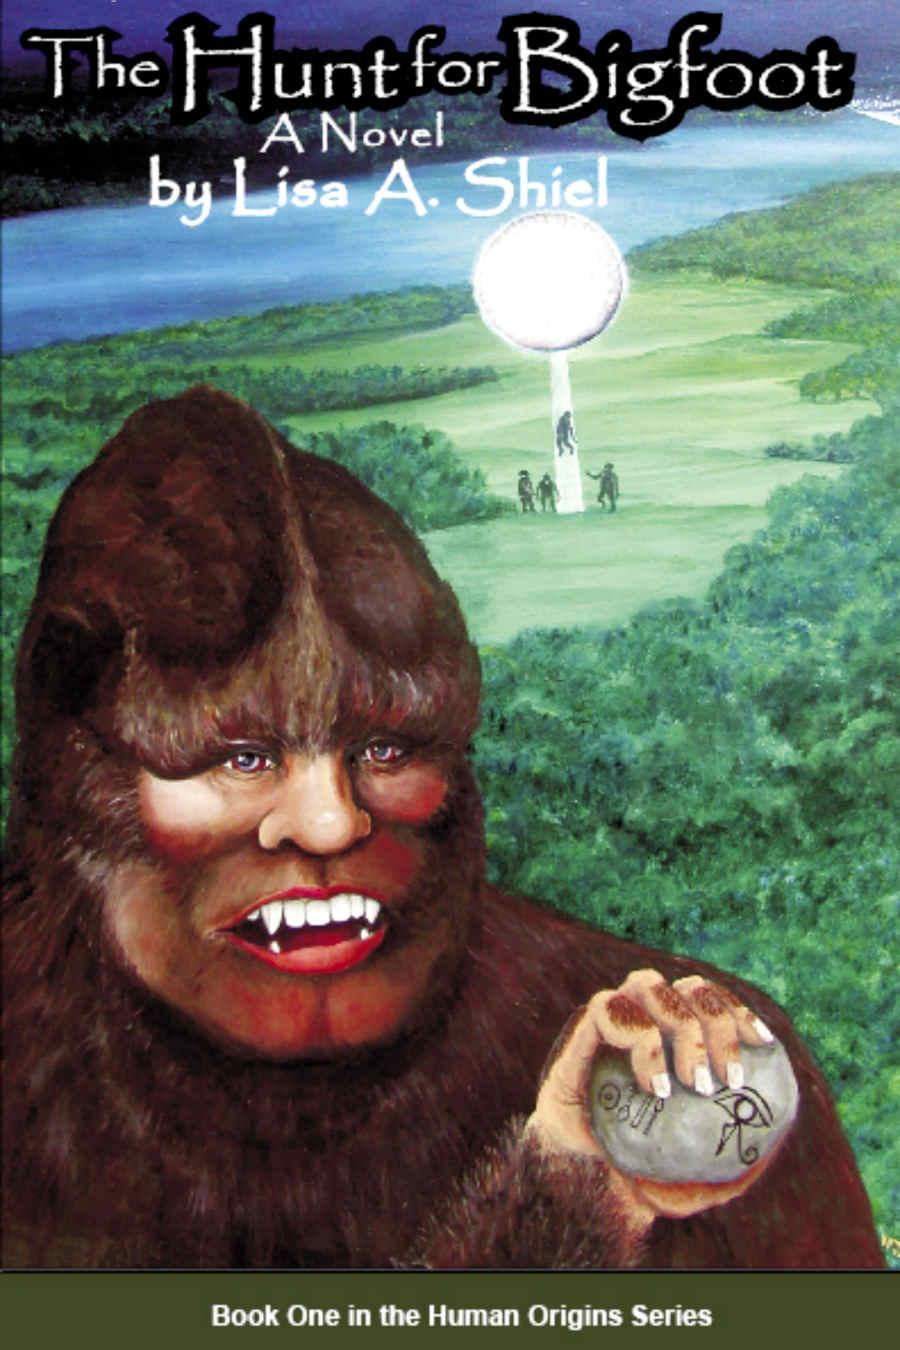 The Hunt for Bigfoot (Book One, Human Origins Series)